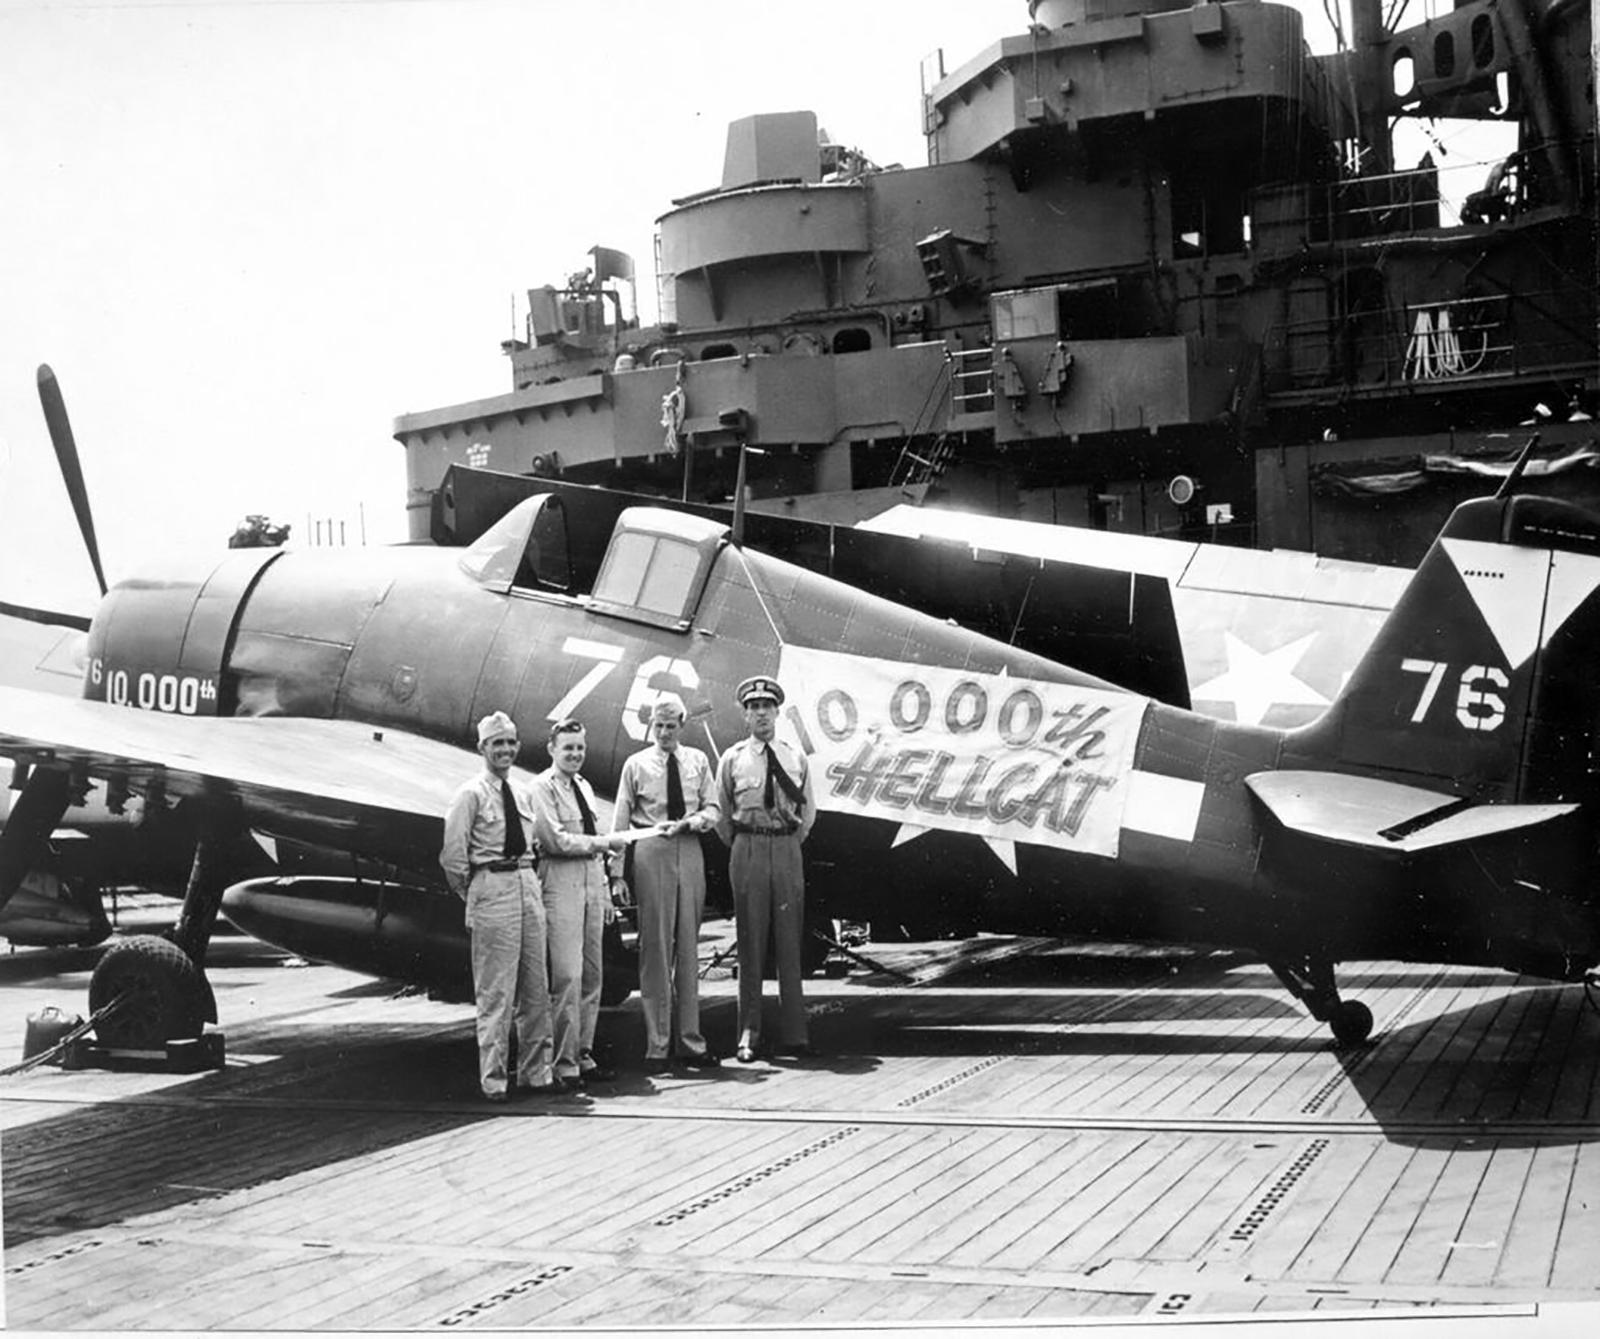 Grumman F6F 5 Hellcat VBF 87 White 76 named 10,000th Hellcat CV 14 USS Ticonderoga June 1945 02